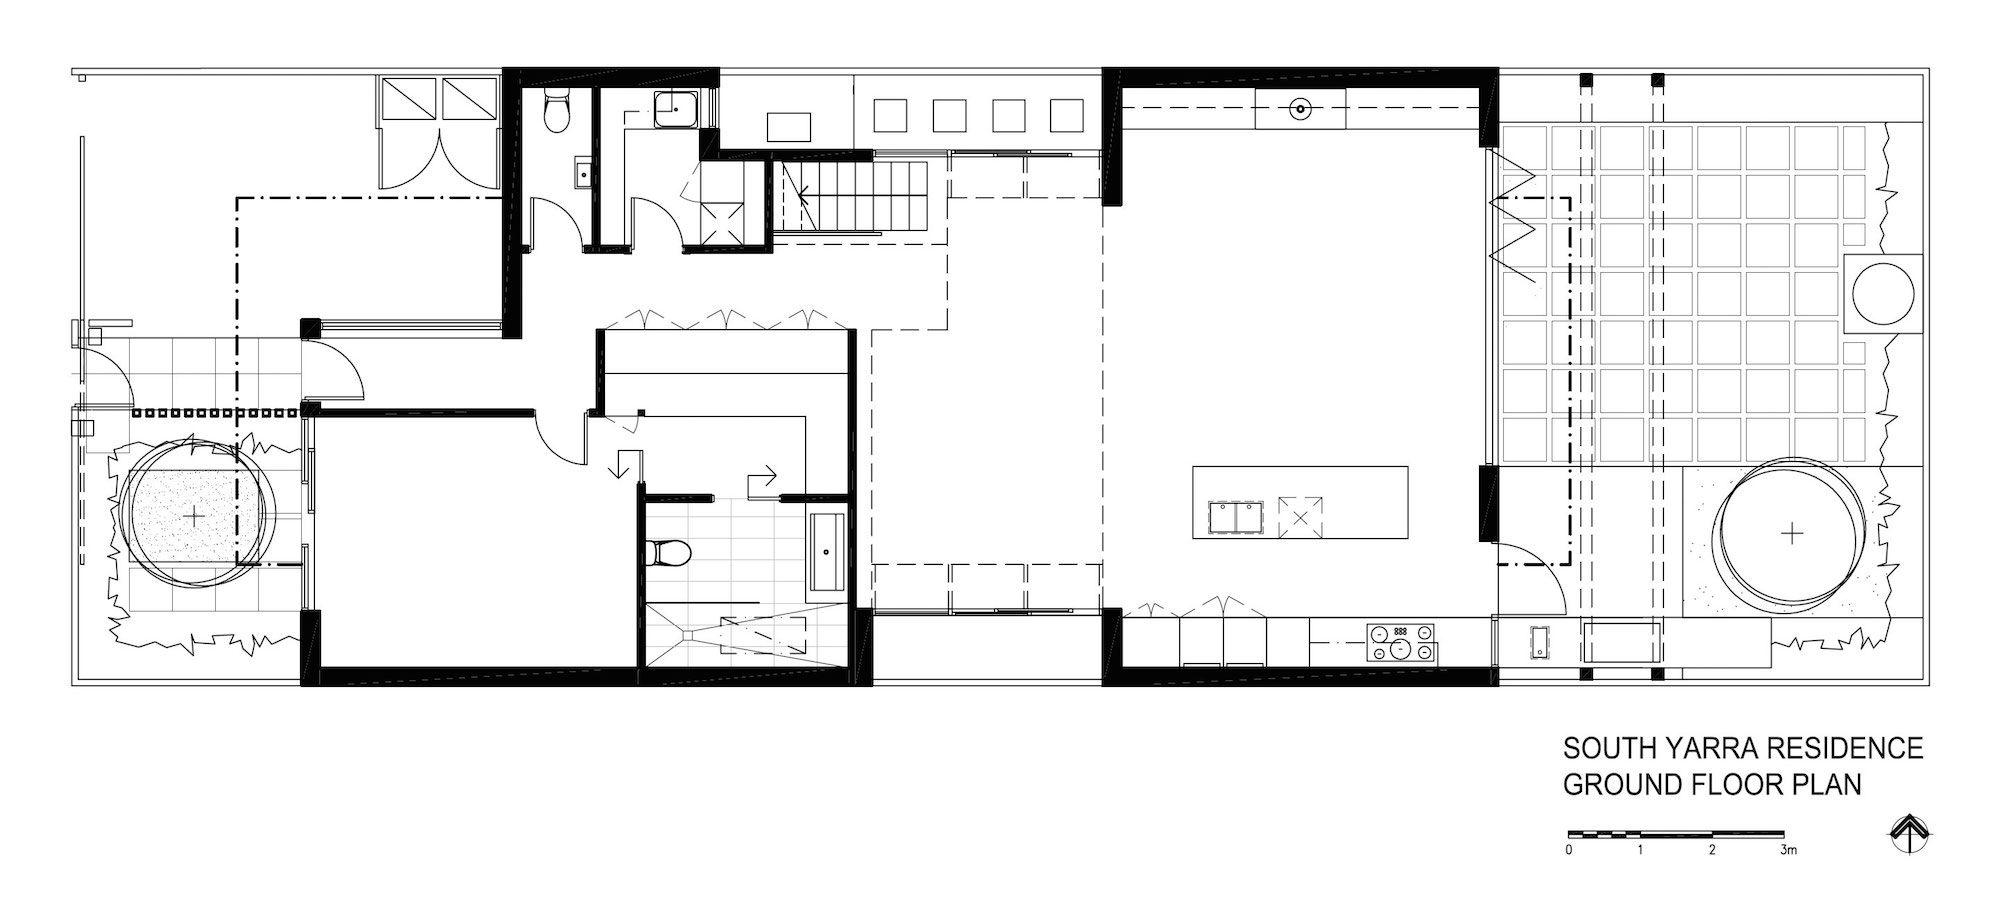 Dise o de casa moderna de dos plantas planos for Planos de casas de 2 plantas